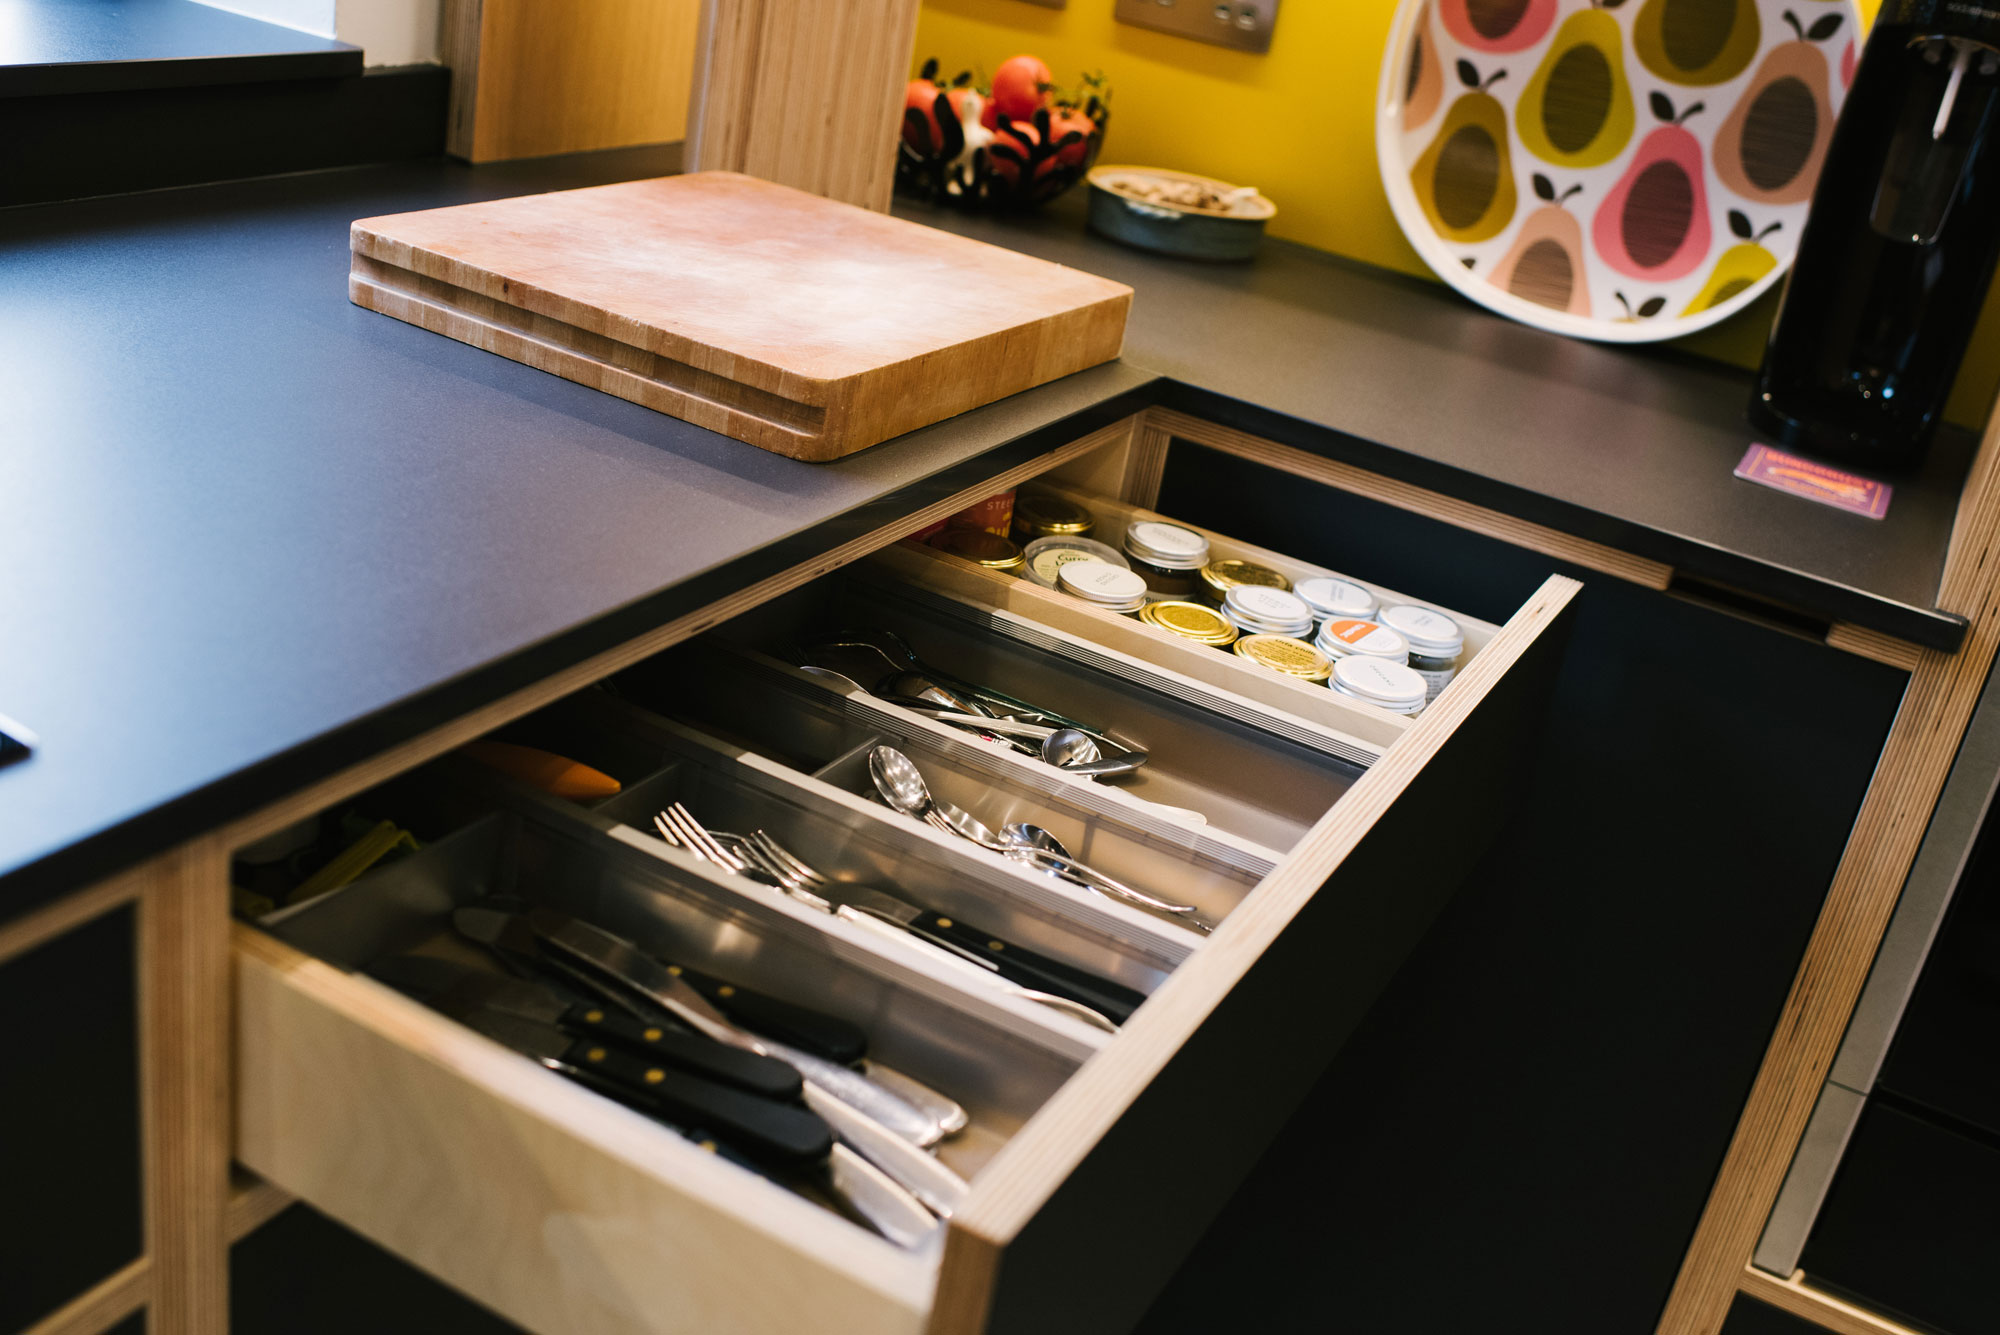 Cutlery Drawer of Black Plywood Kitchen with Yellow Splashback